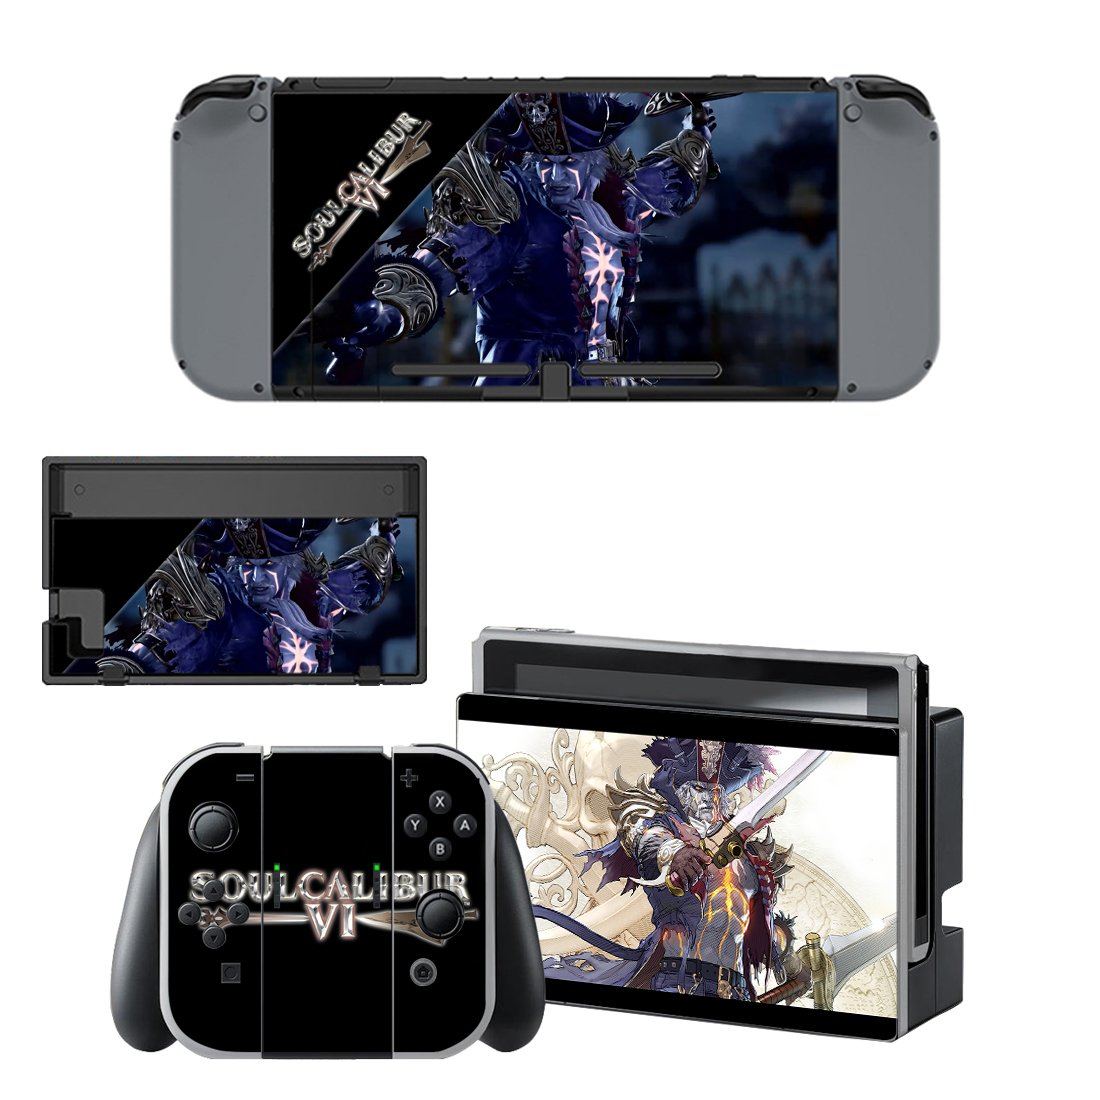 Soulcalibur 6 Nintendo switch console sticker skin